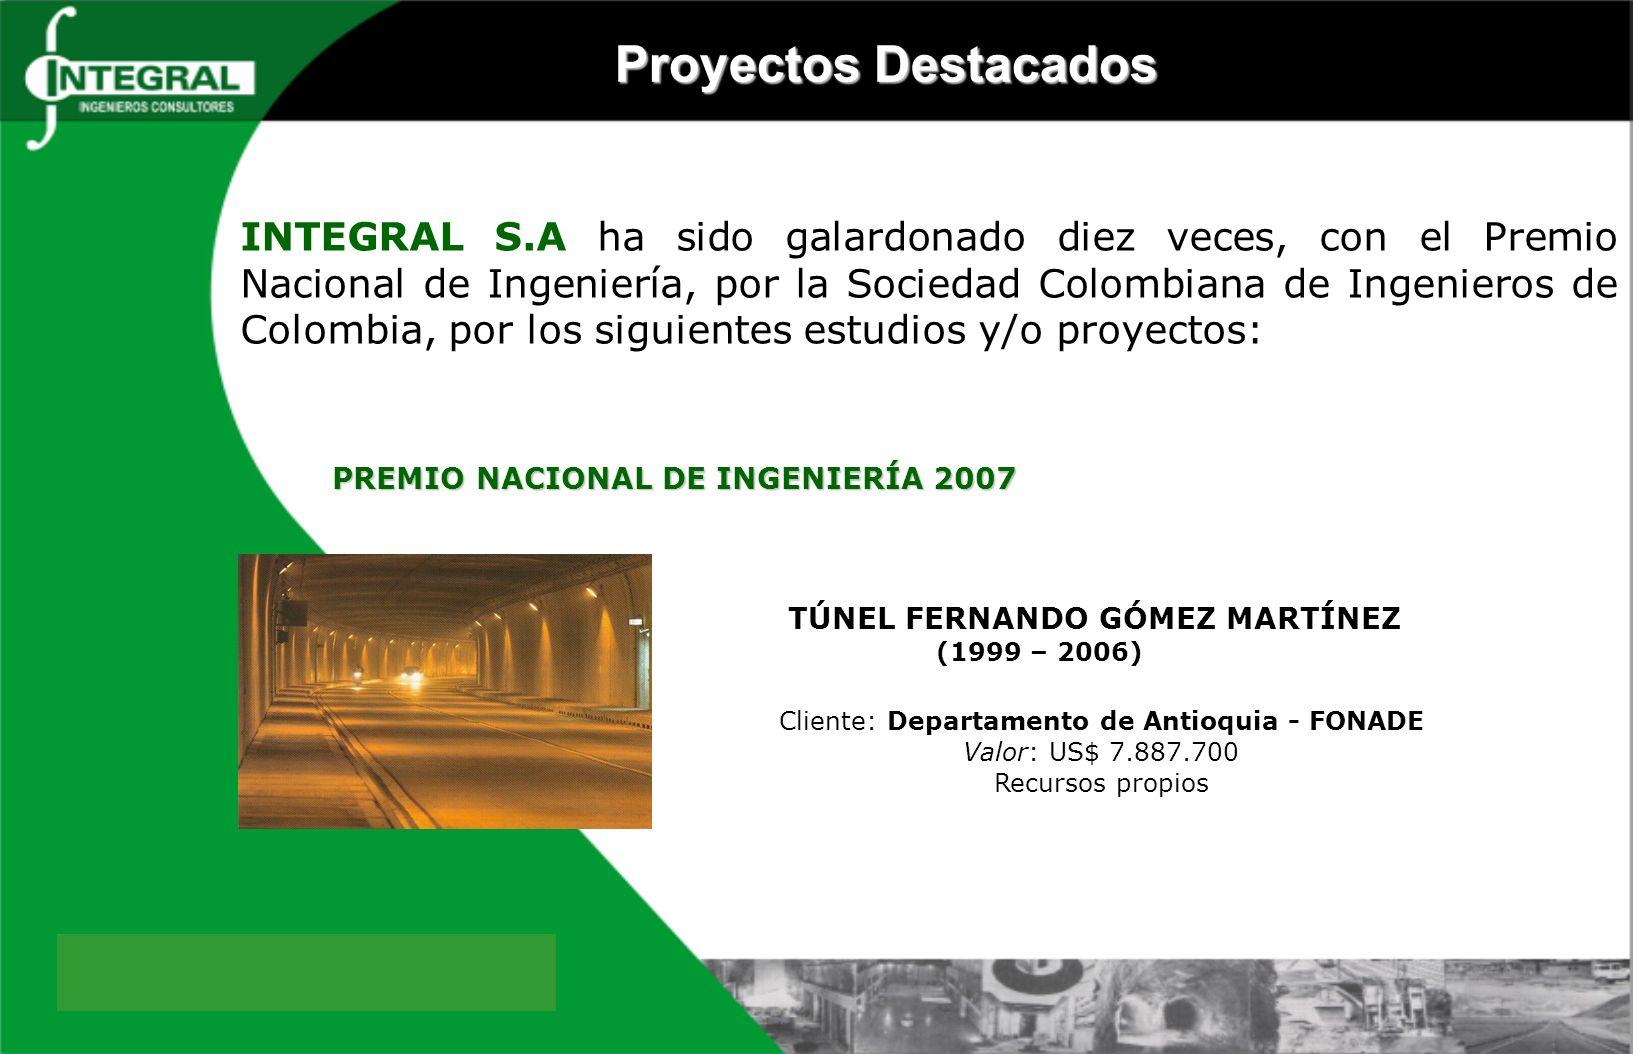 TÚNEL FERNANDO GÓMEZ MARTÍNEZ